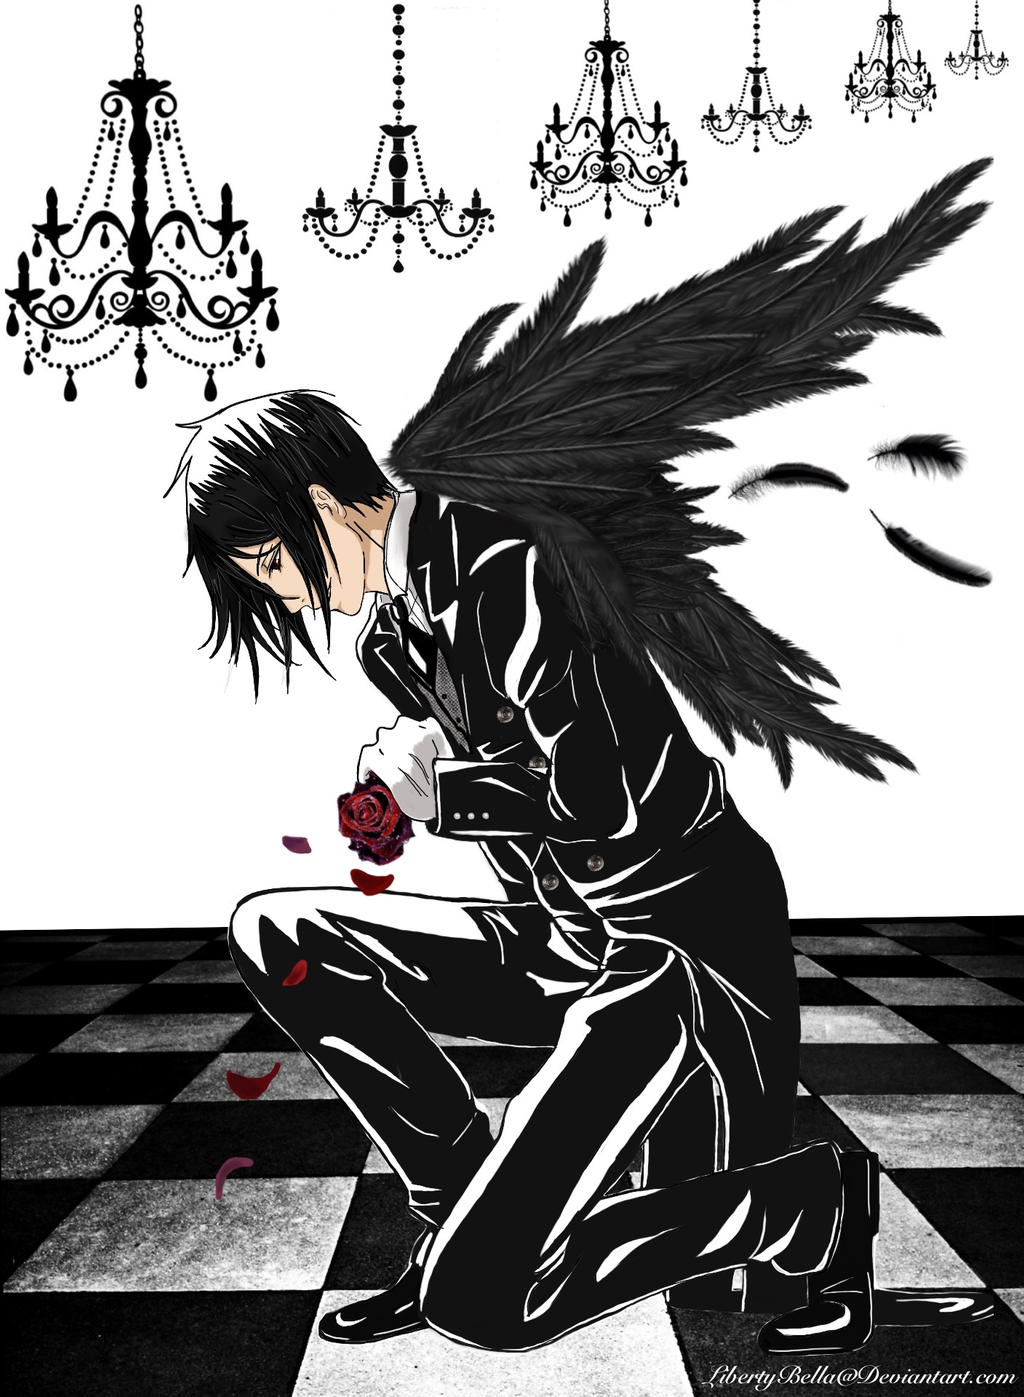 His Butler - Fallen Angel by LibertyBella